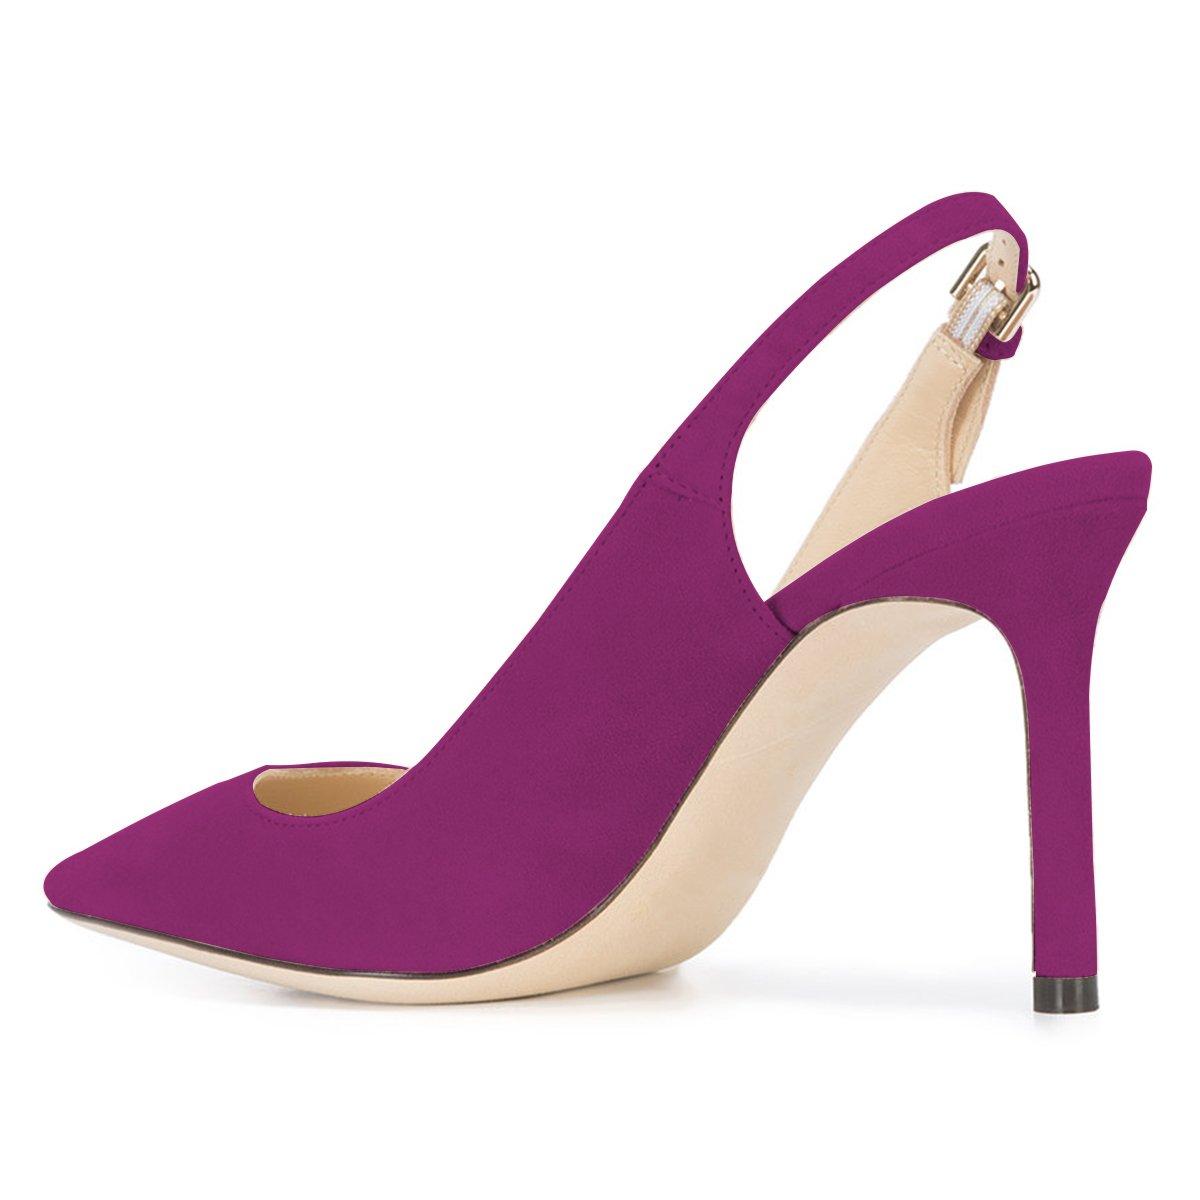 ac82c313ef4 ... NJPU Women Pointed Toe Slingback Pumps Stiletto High High High Heels  Office Shoes with Buckle B07C2MJPZJ ...